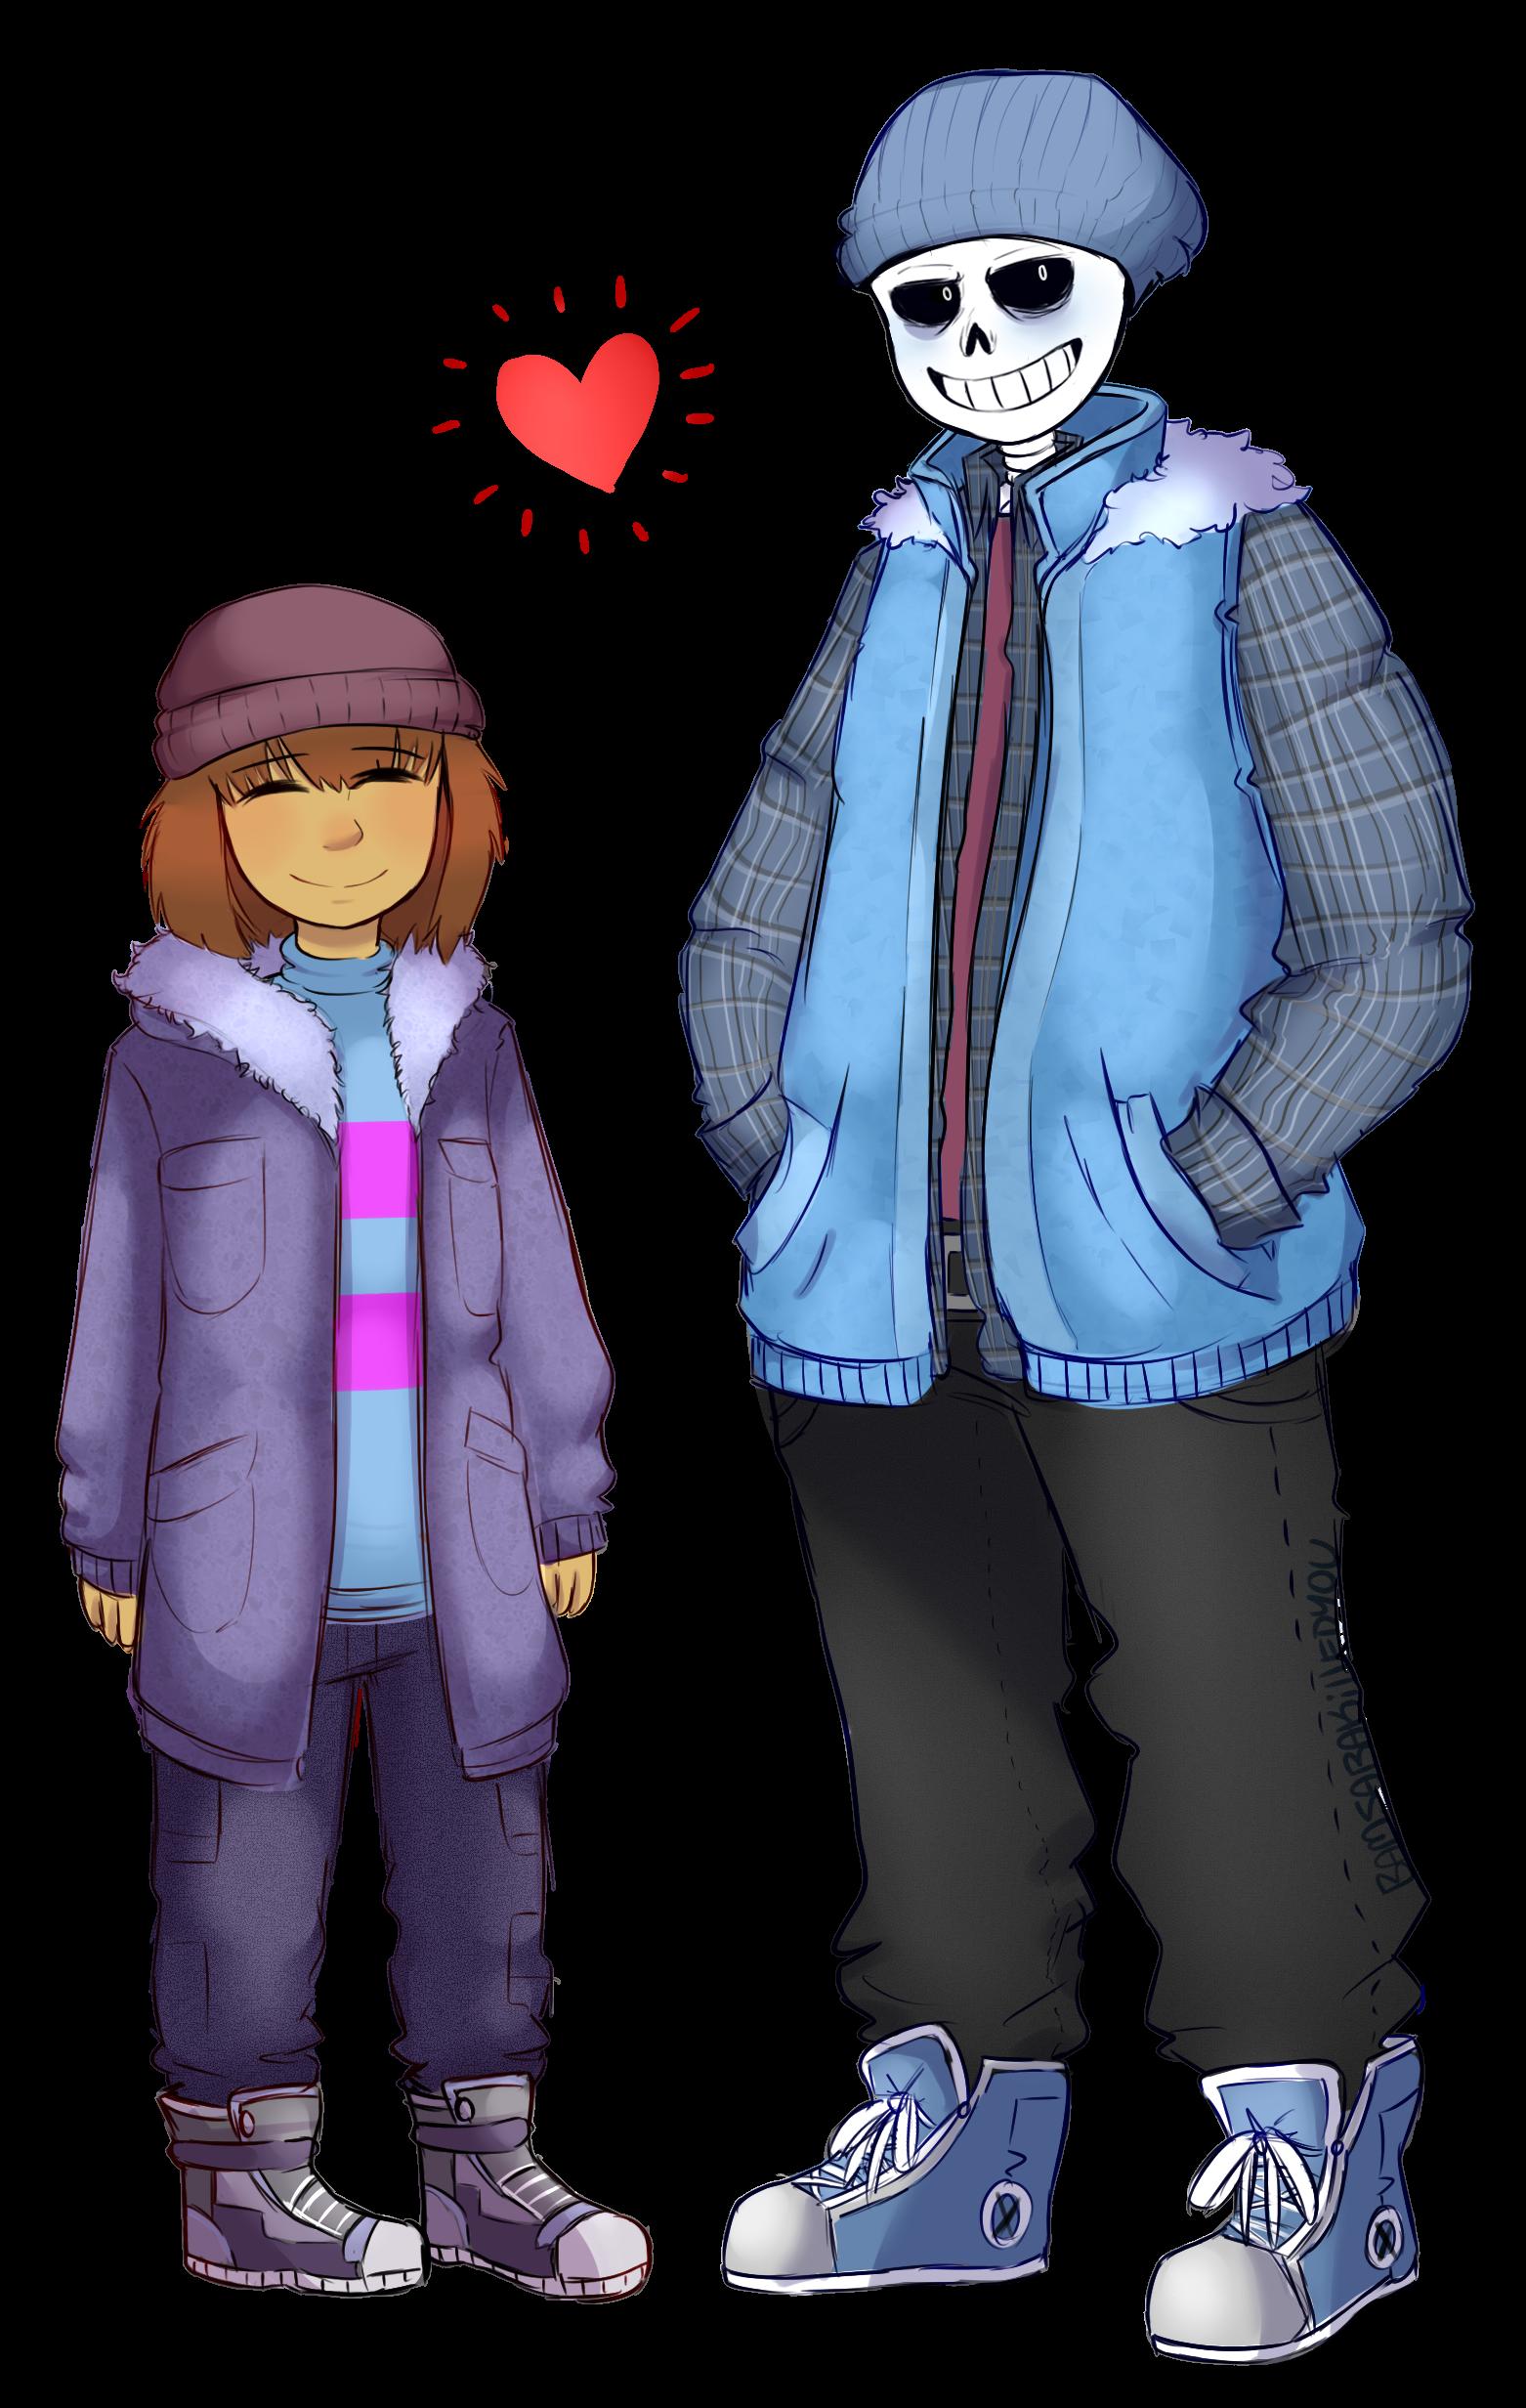 winter clothes by bamsarakilledyou on deviantart